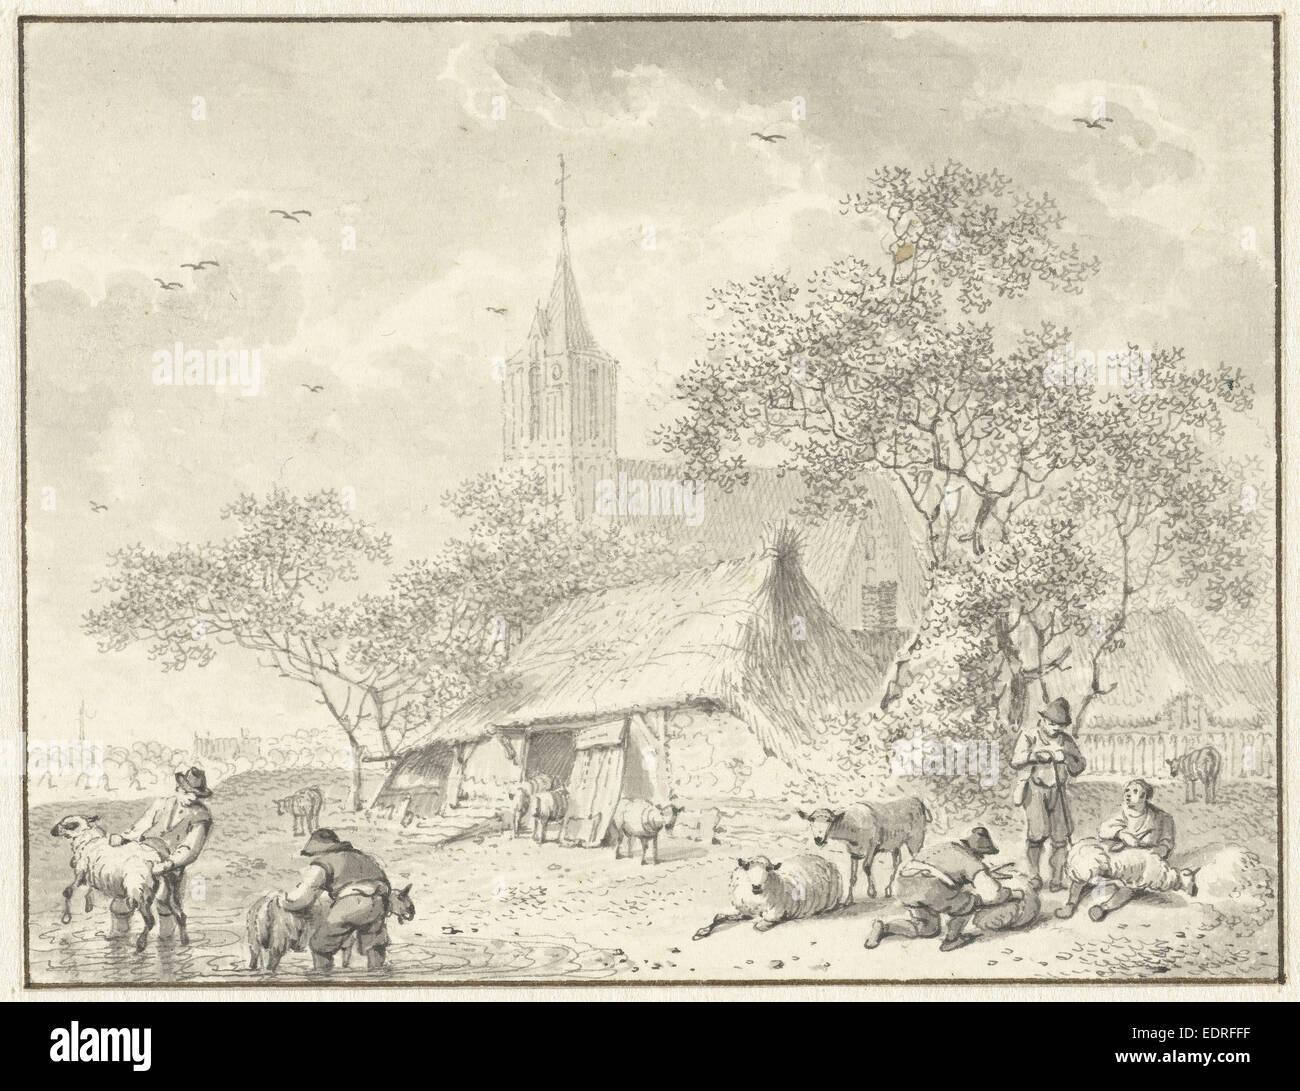 Sheepshearers, Hendrik Meijer, 1784 Stock Photo